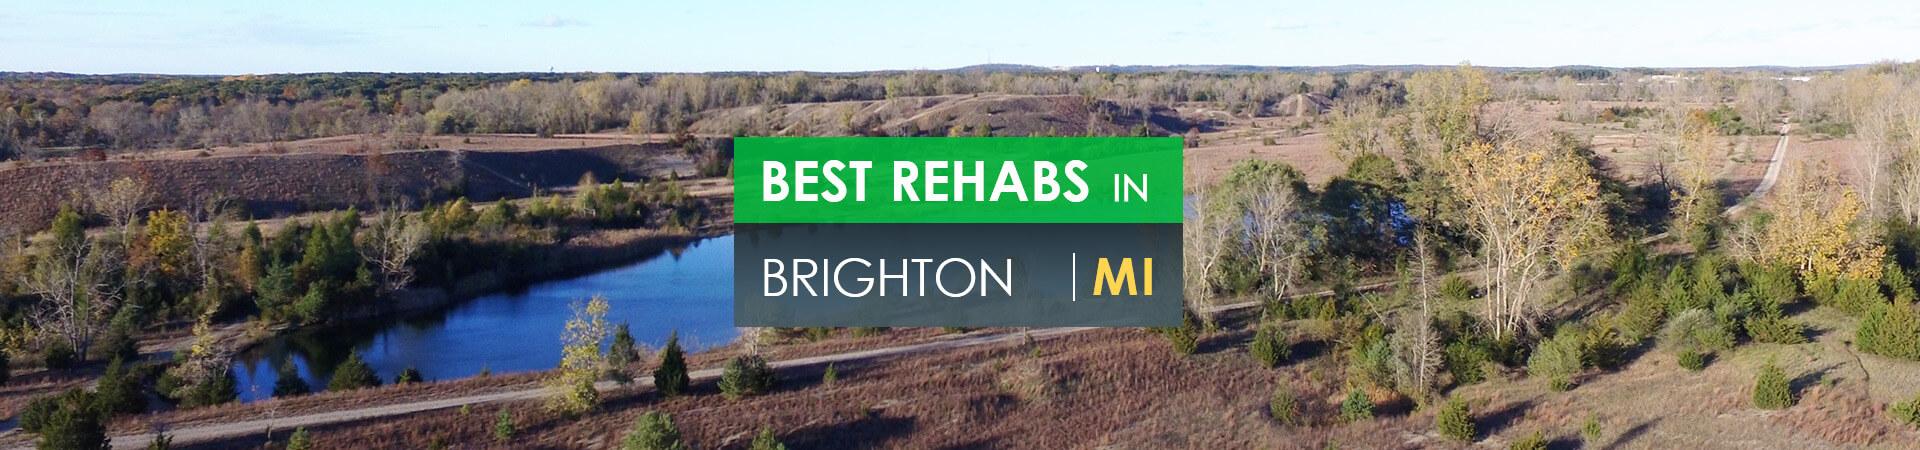 Best rehabs in Brighton, MI